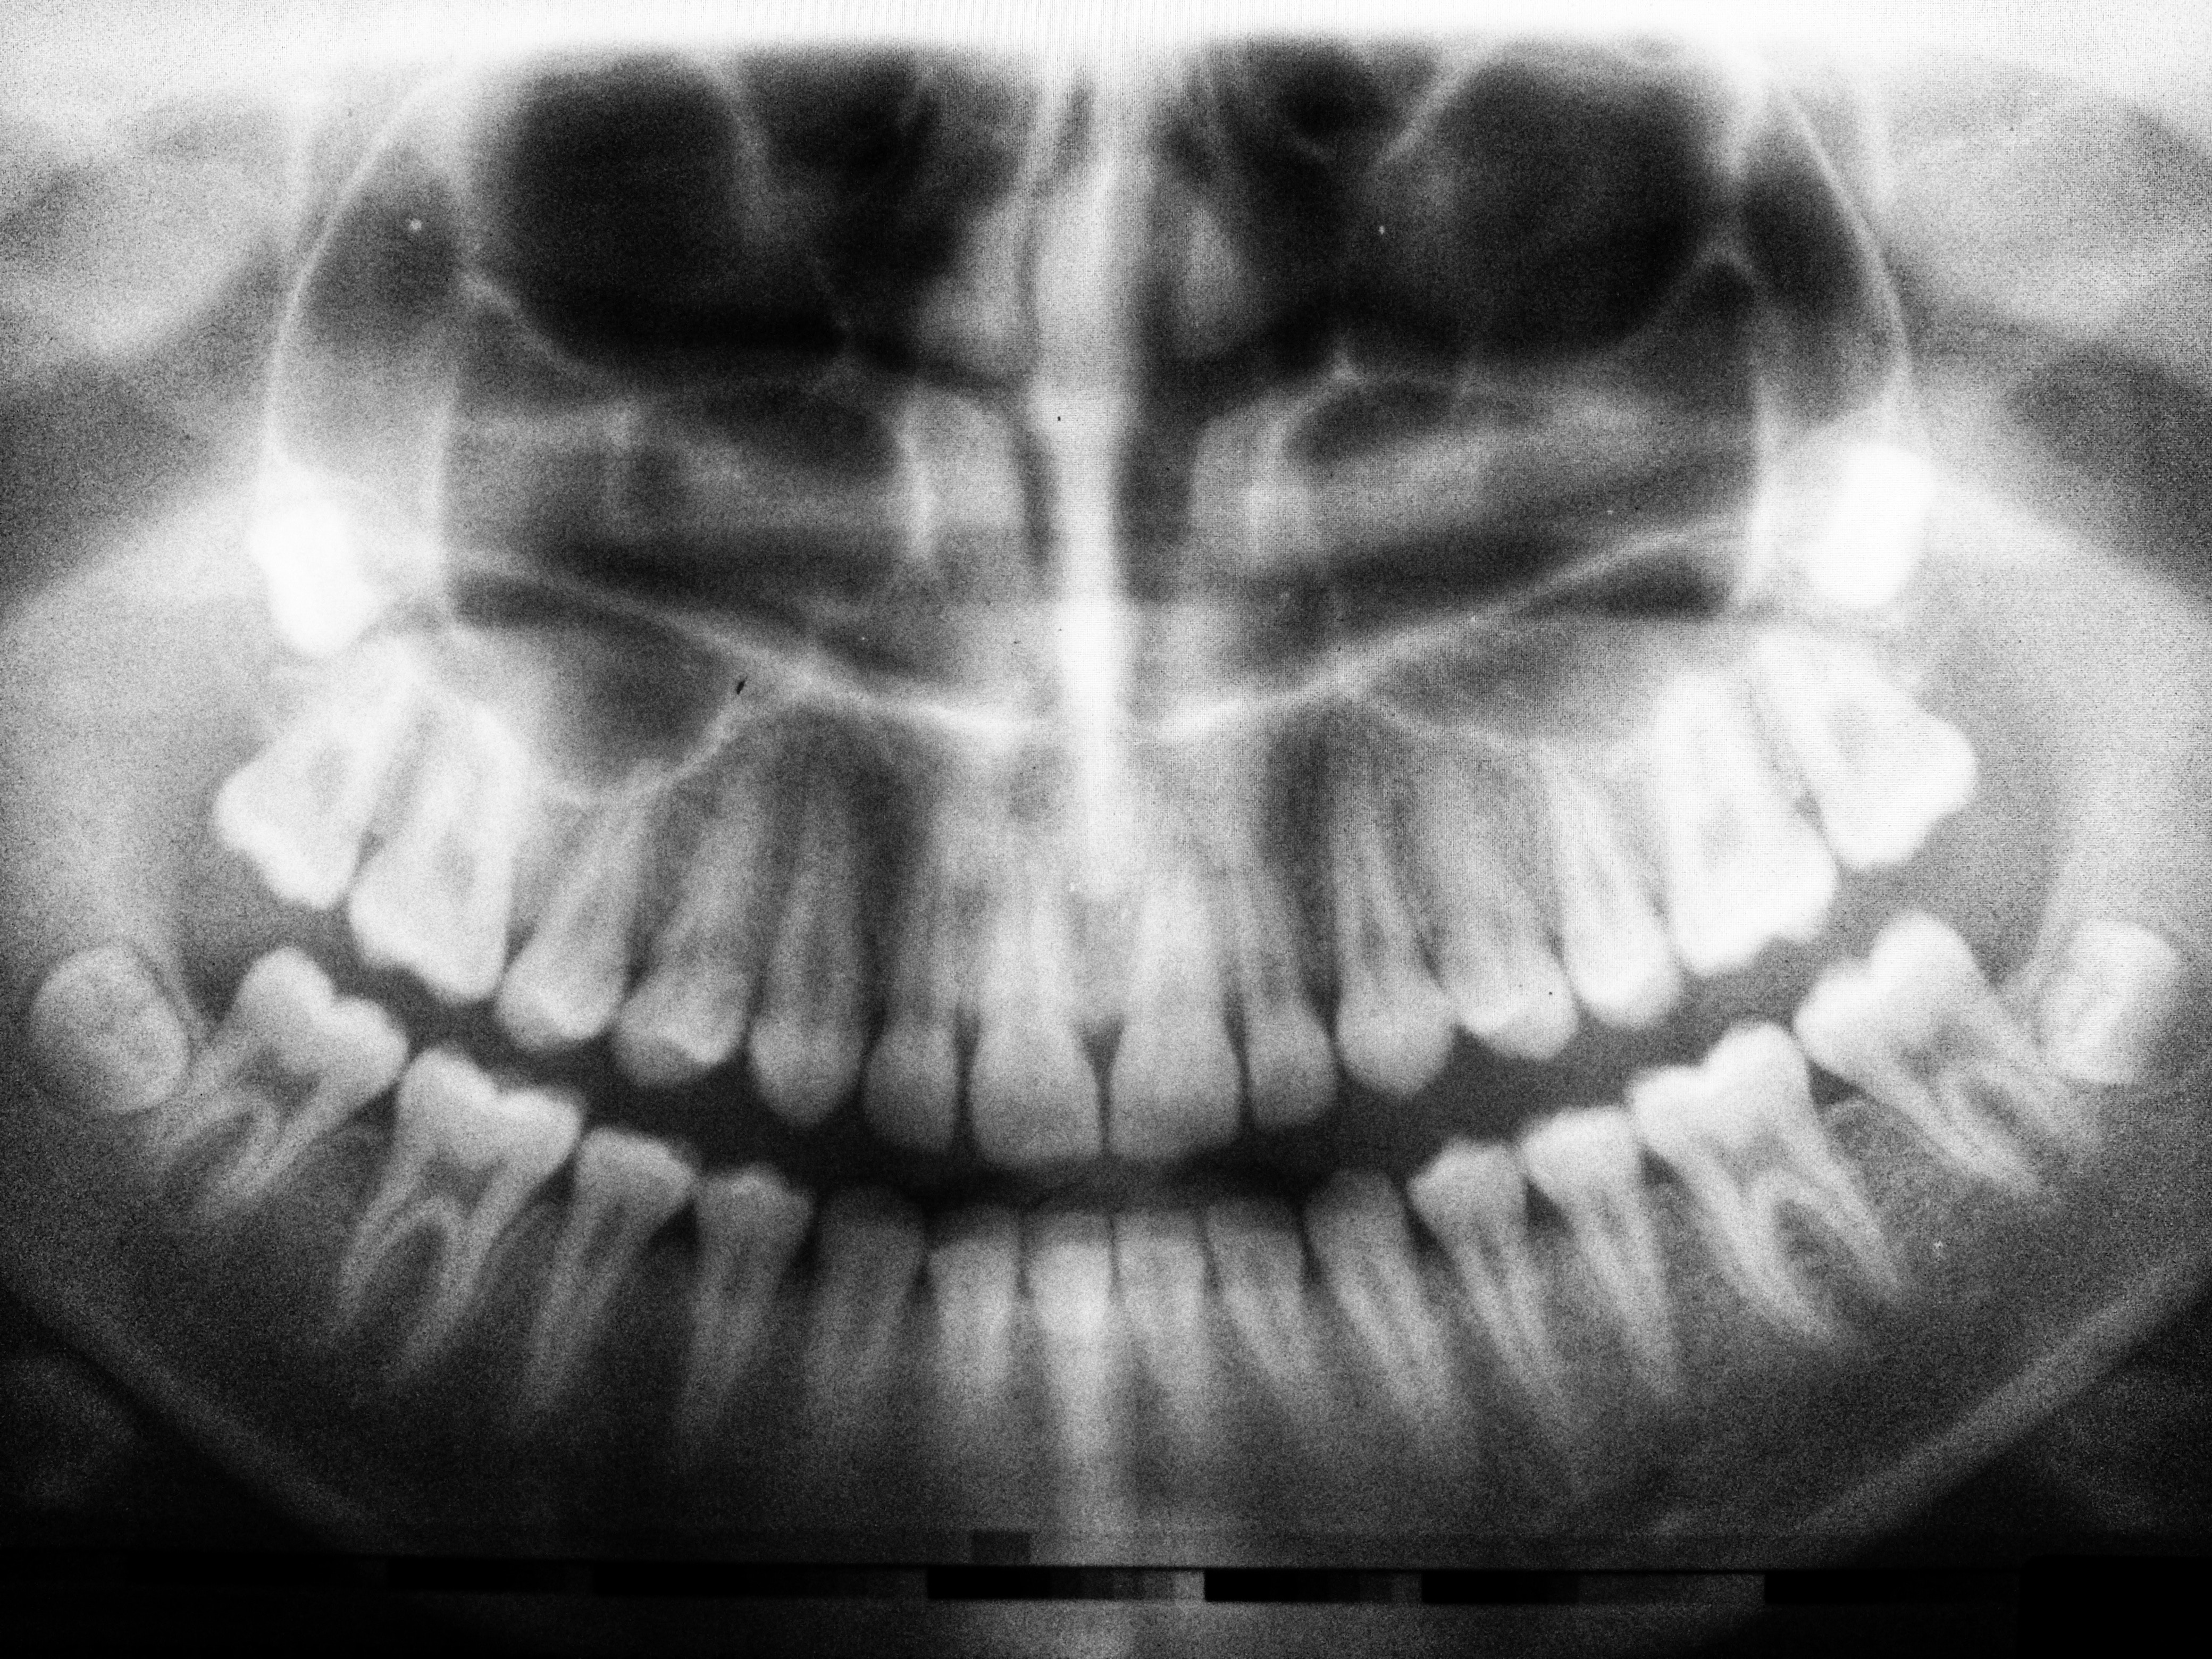 Difficult dental treatments